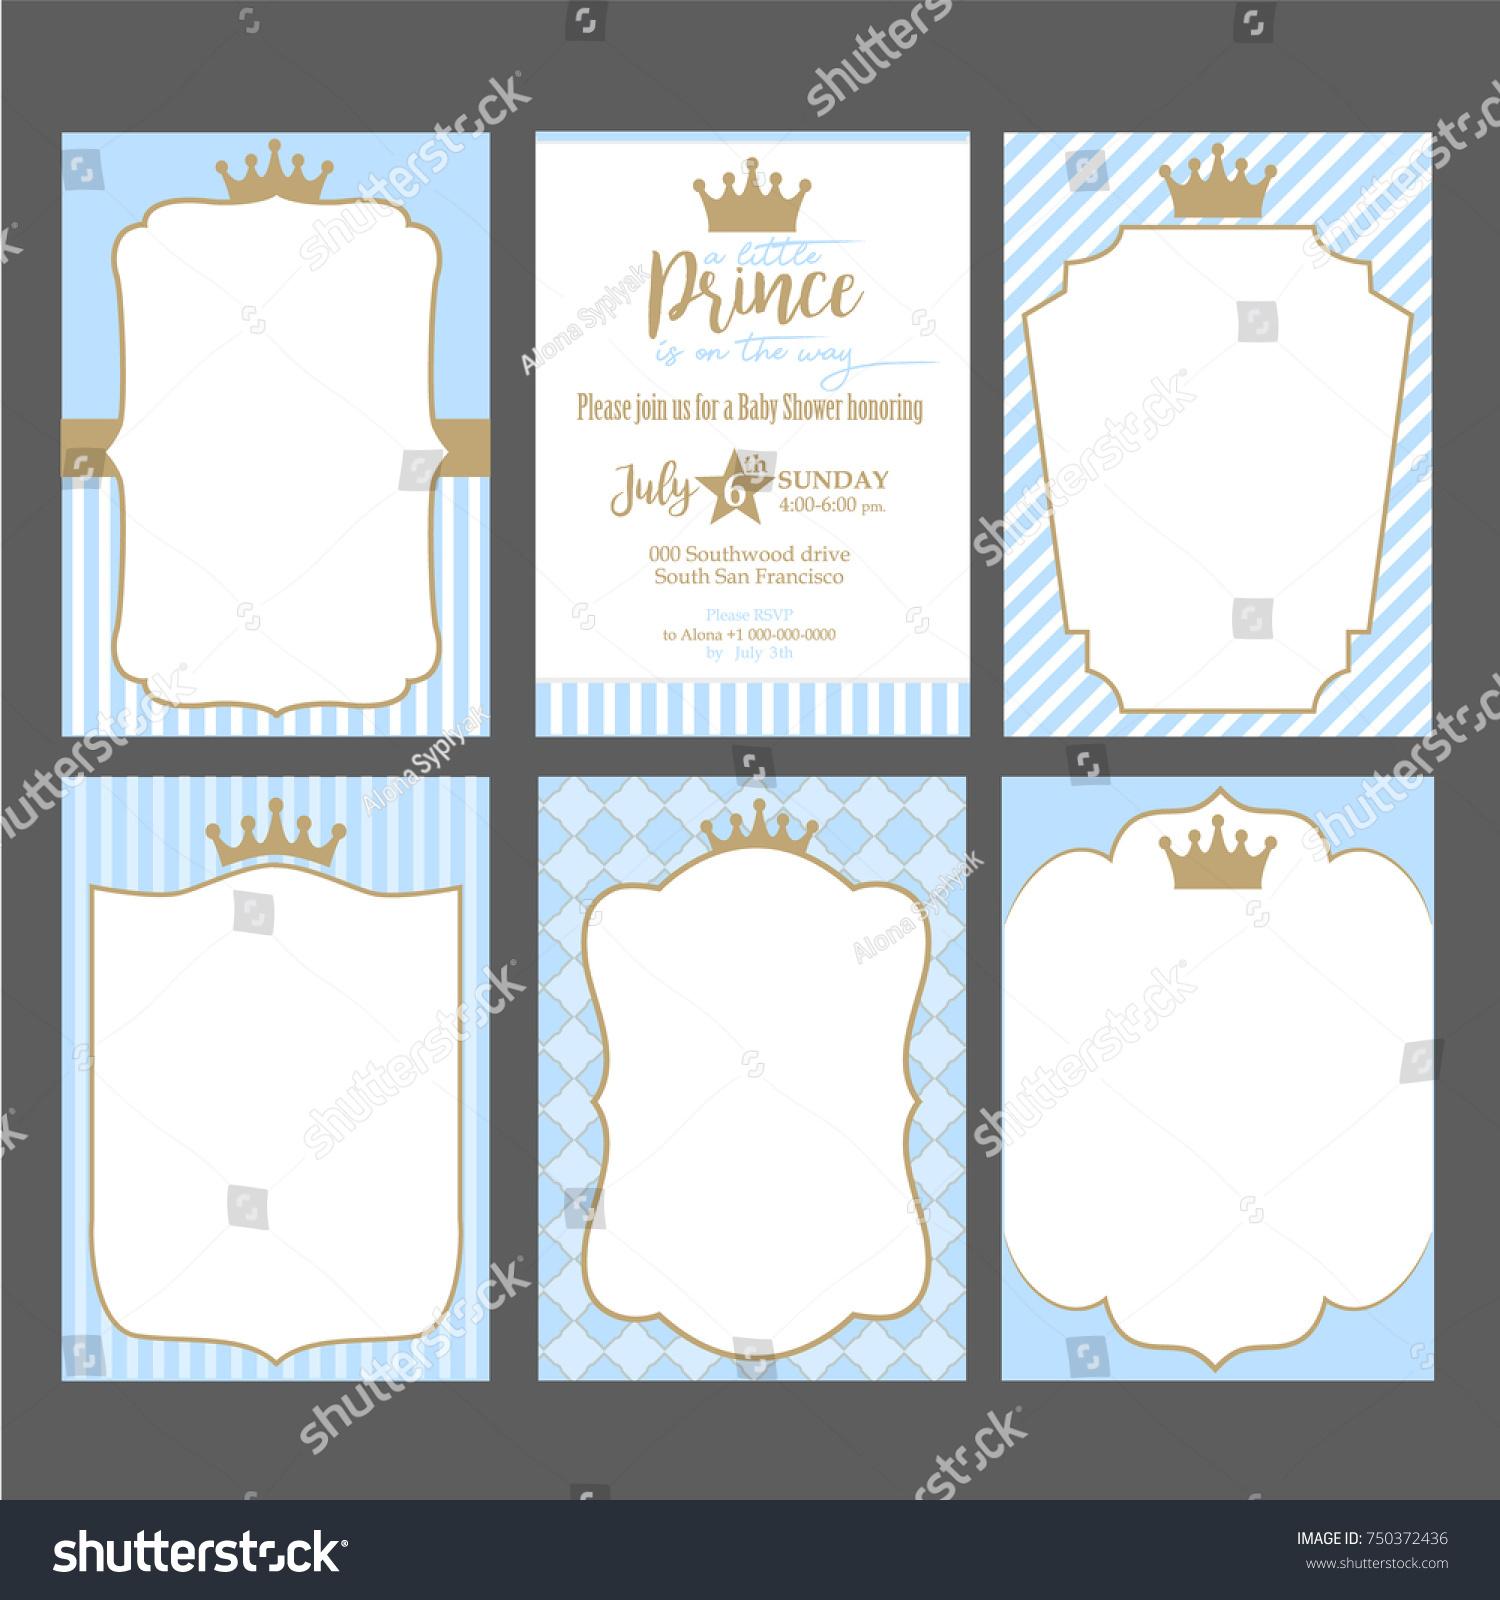 Prince baby shower invites little prince ba shower invitations ba.